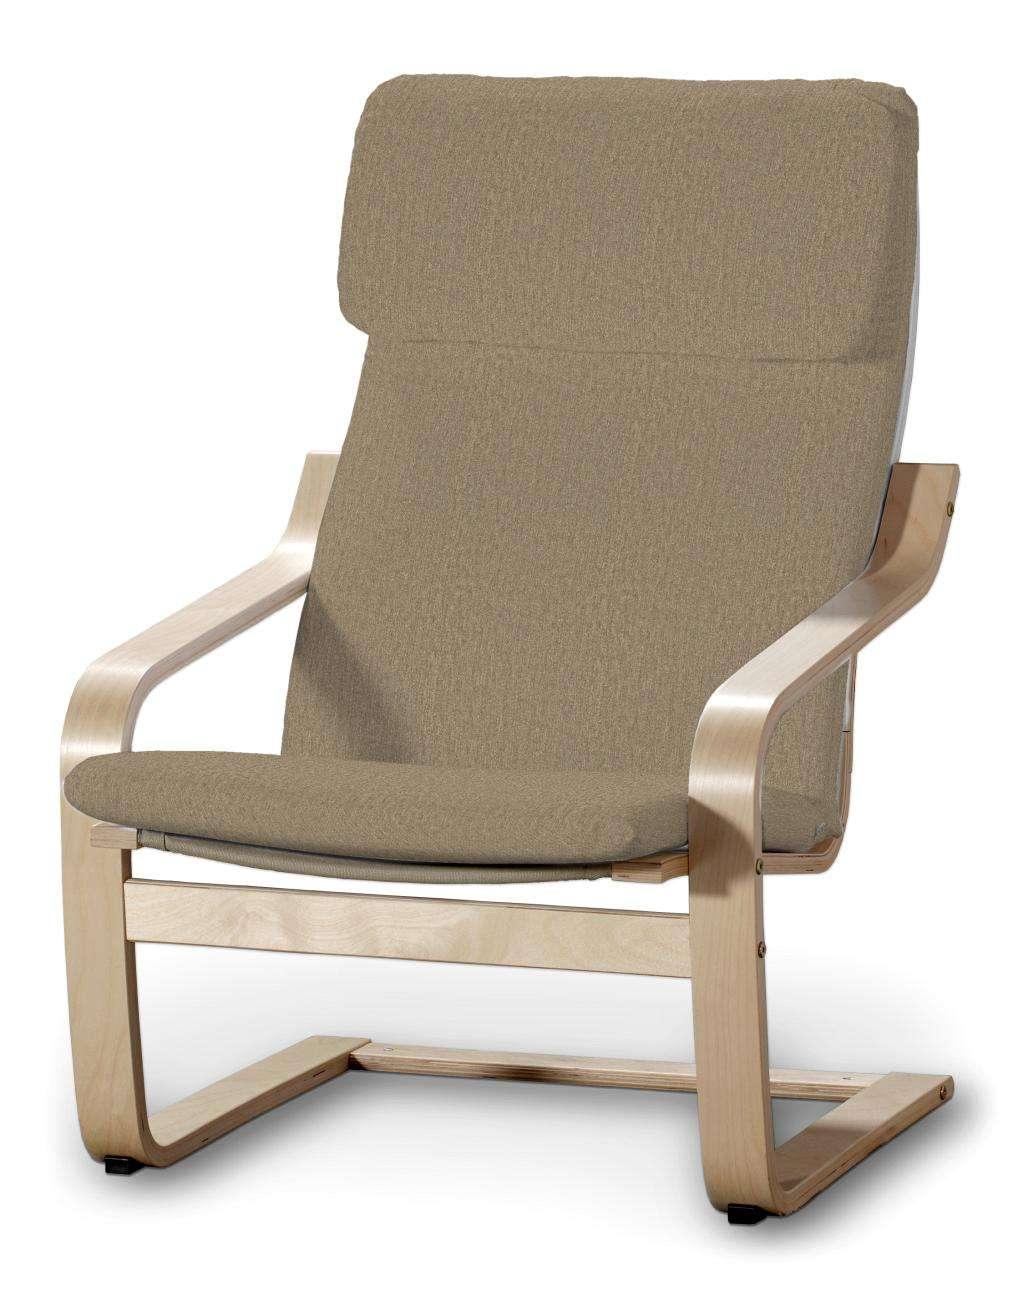 POÄNG  fotelio užvalkalas Poäng armchair kolekcijoje Chenille, audinys: 702-21